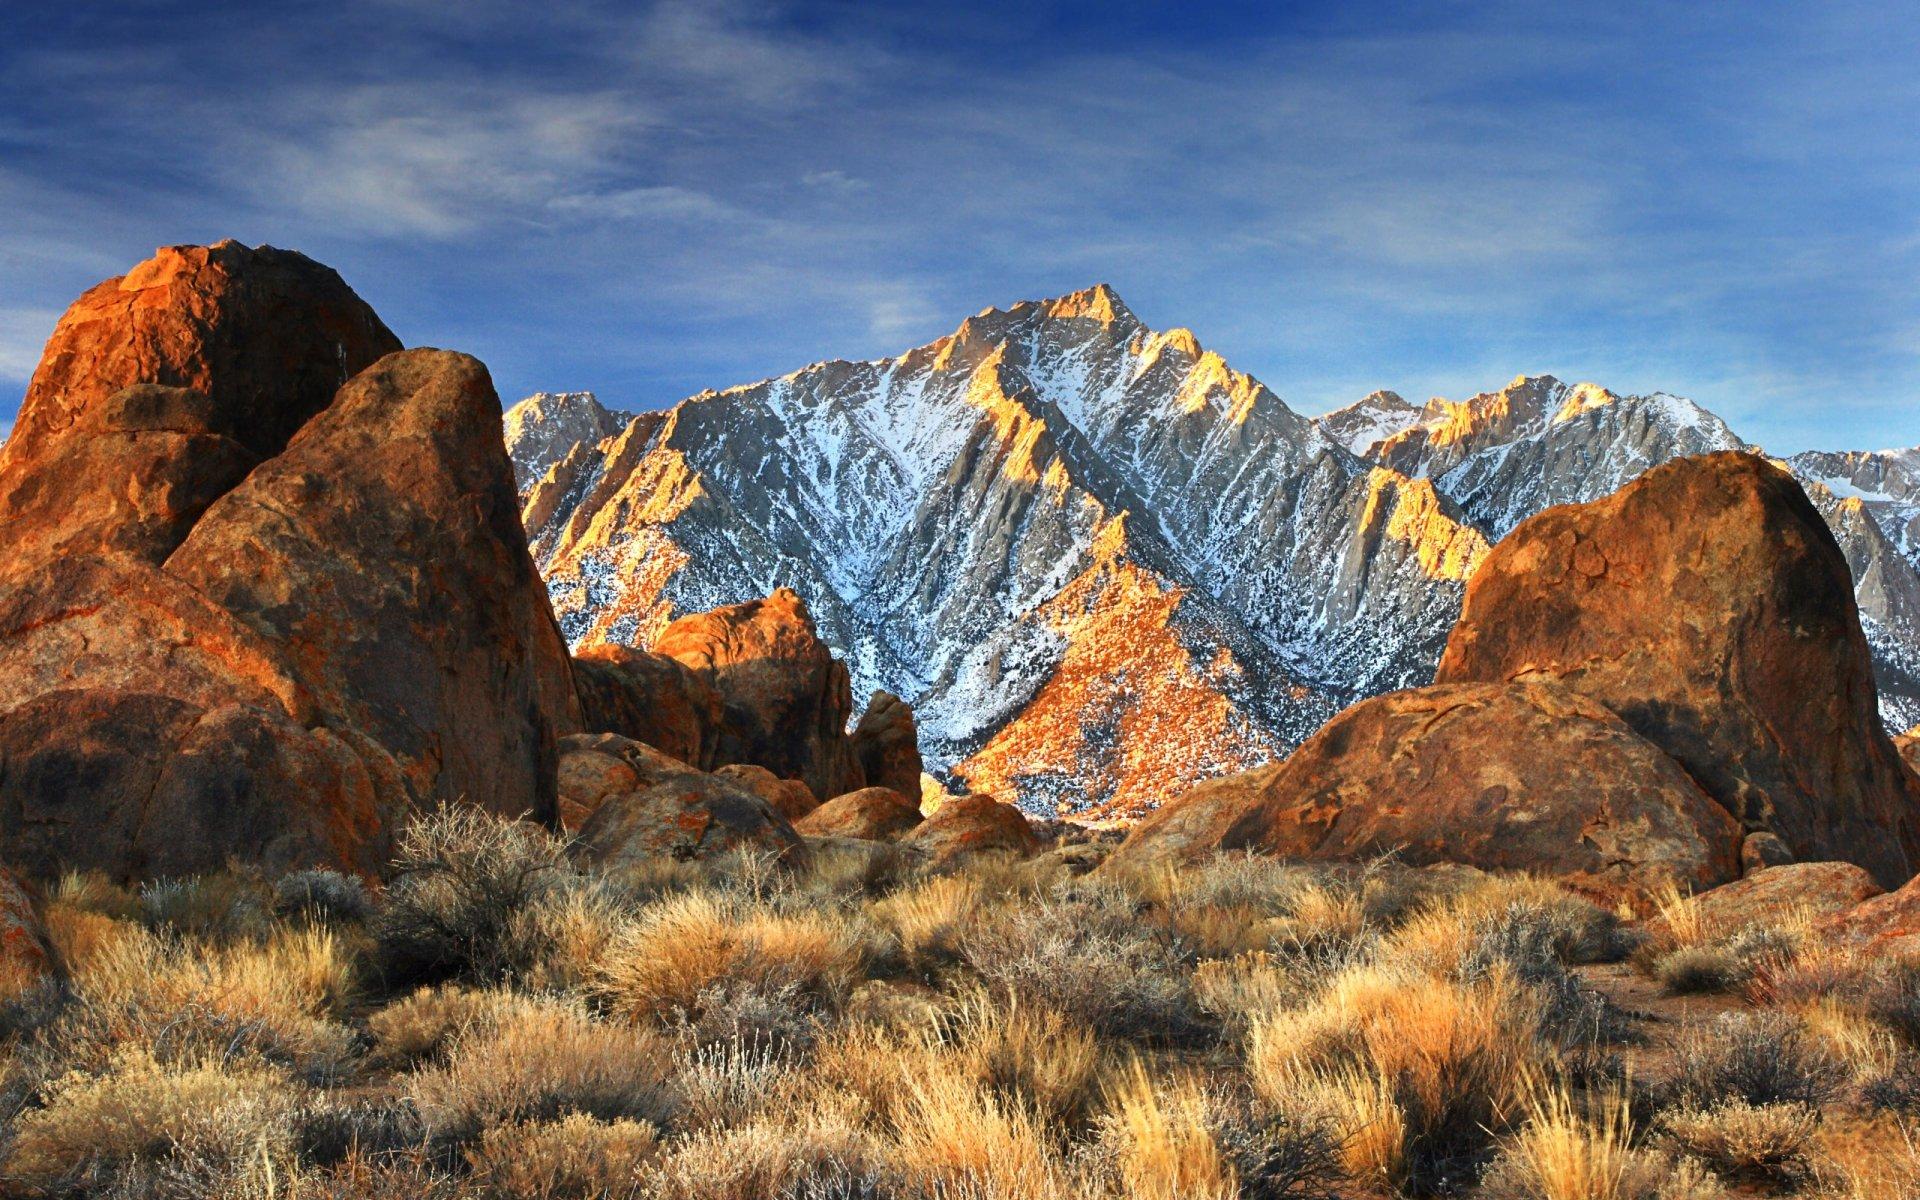 Mountain hd wallpaper background image 2560x1600 id 462176 wallpaper abyss - Nevada wallpaper hd ...